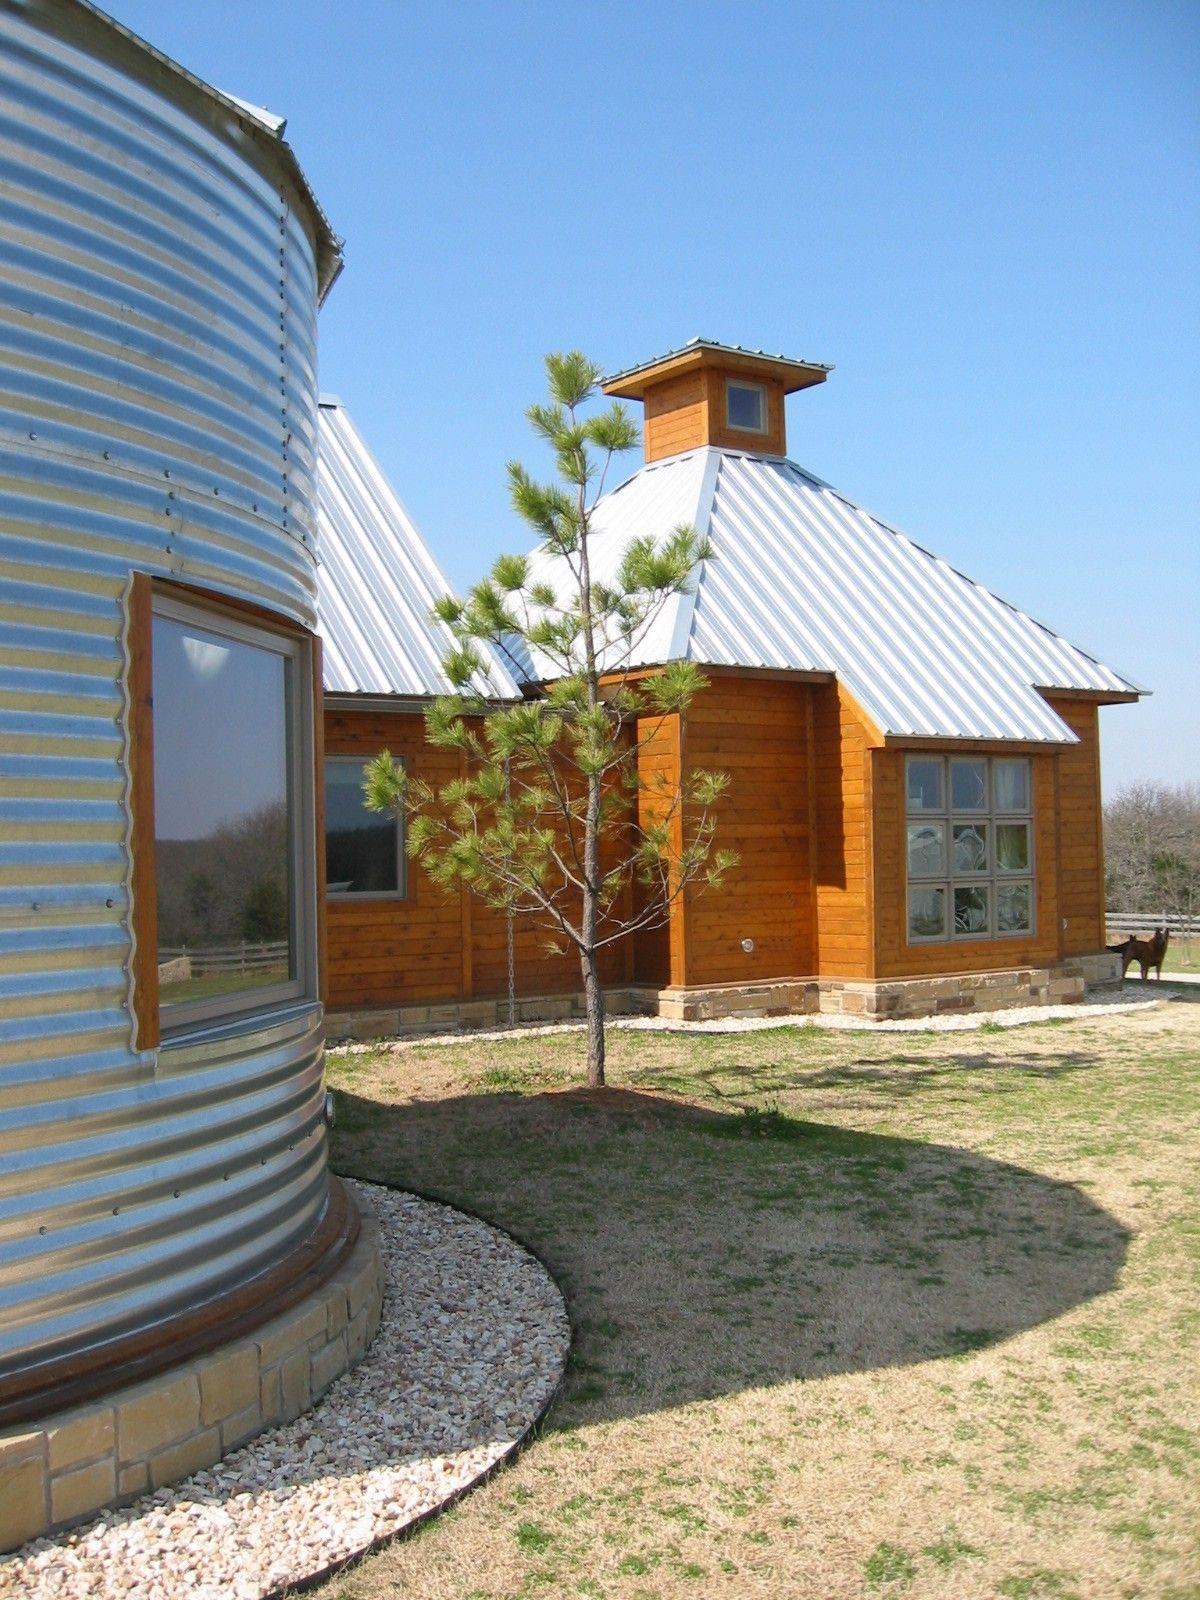 Use grain bin as building materiale